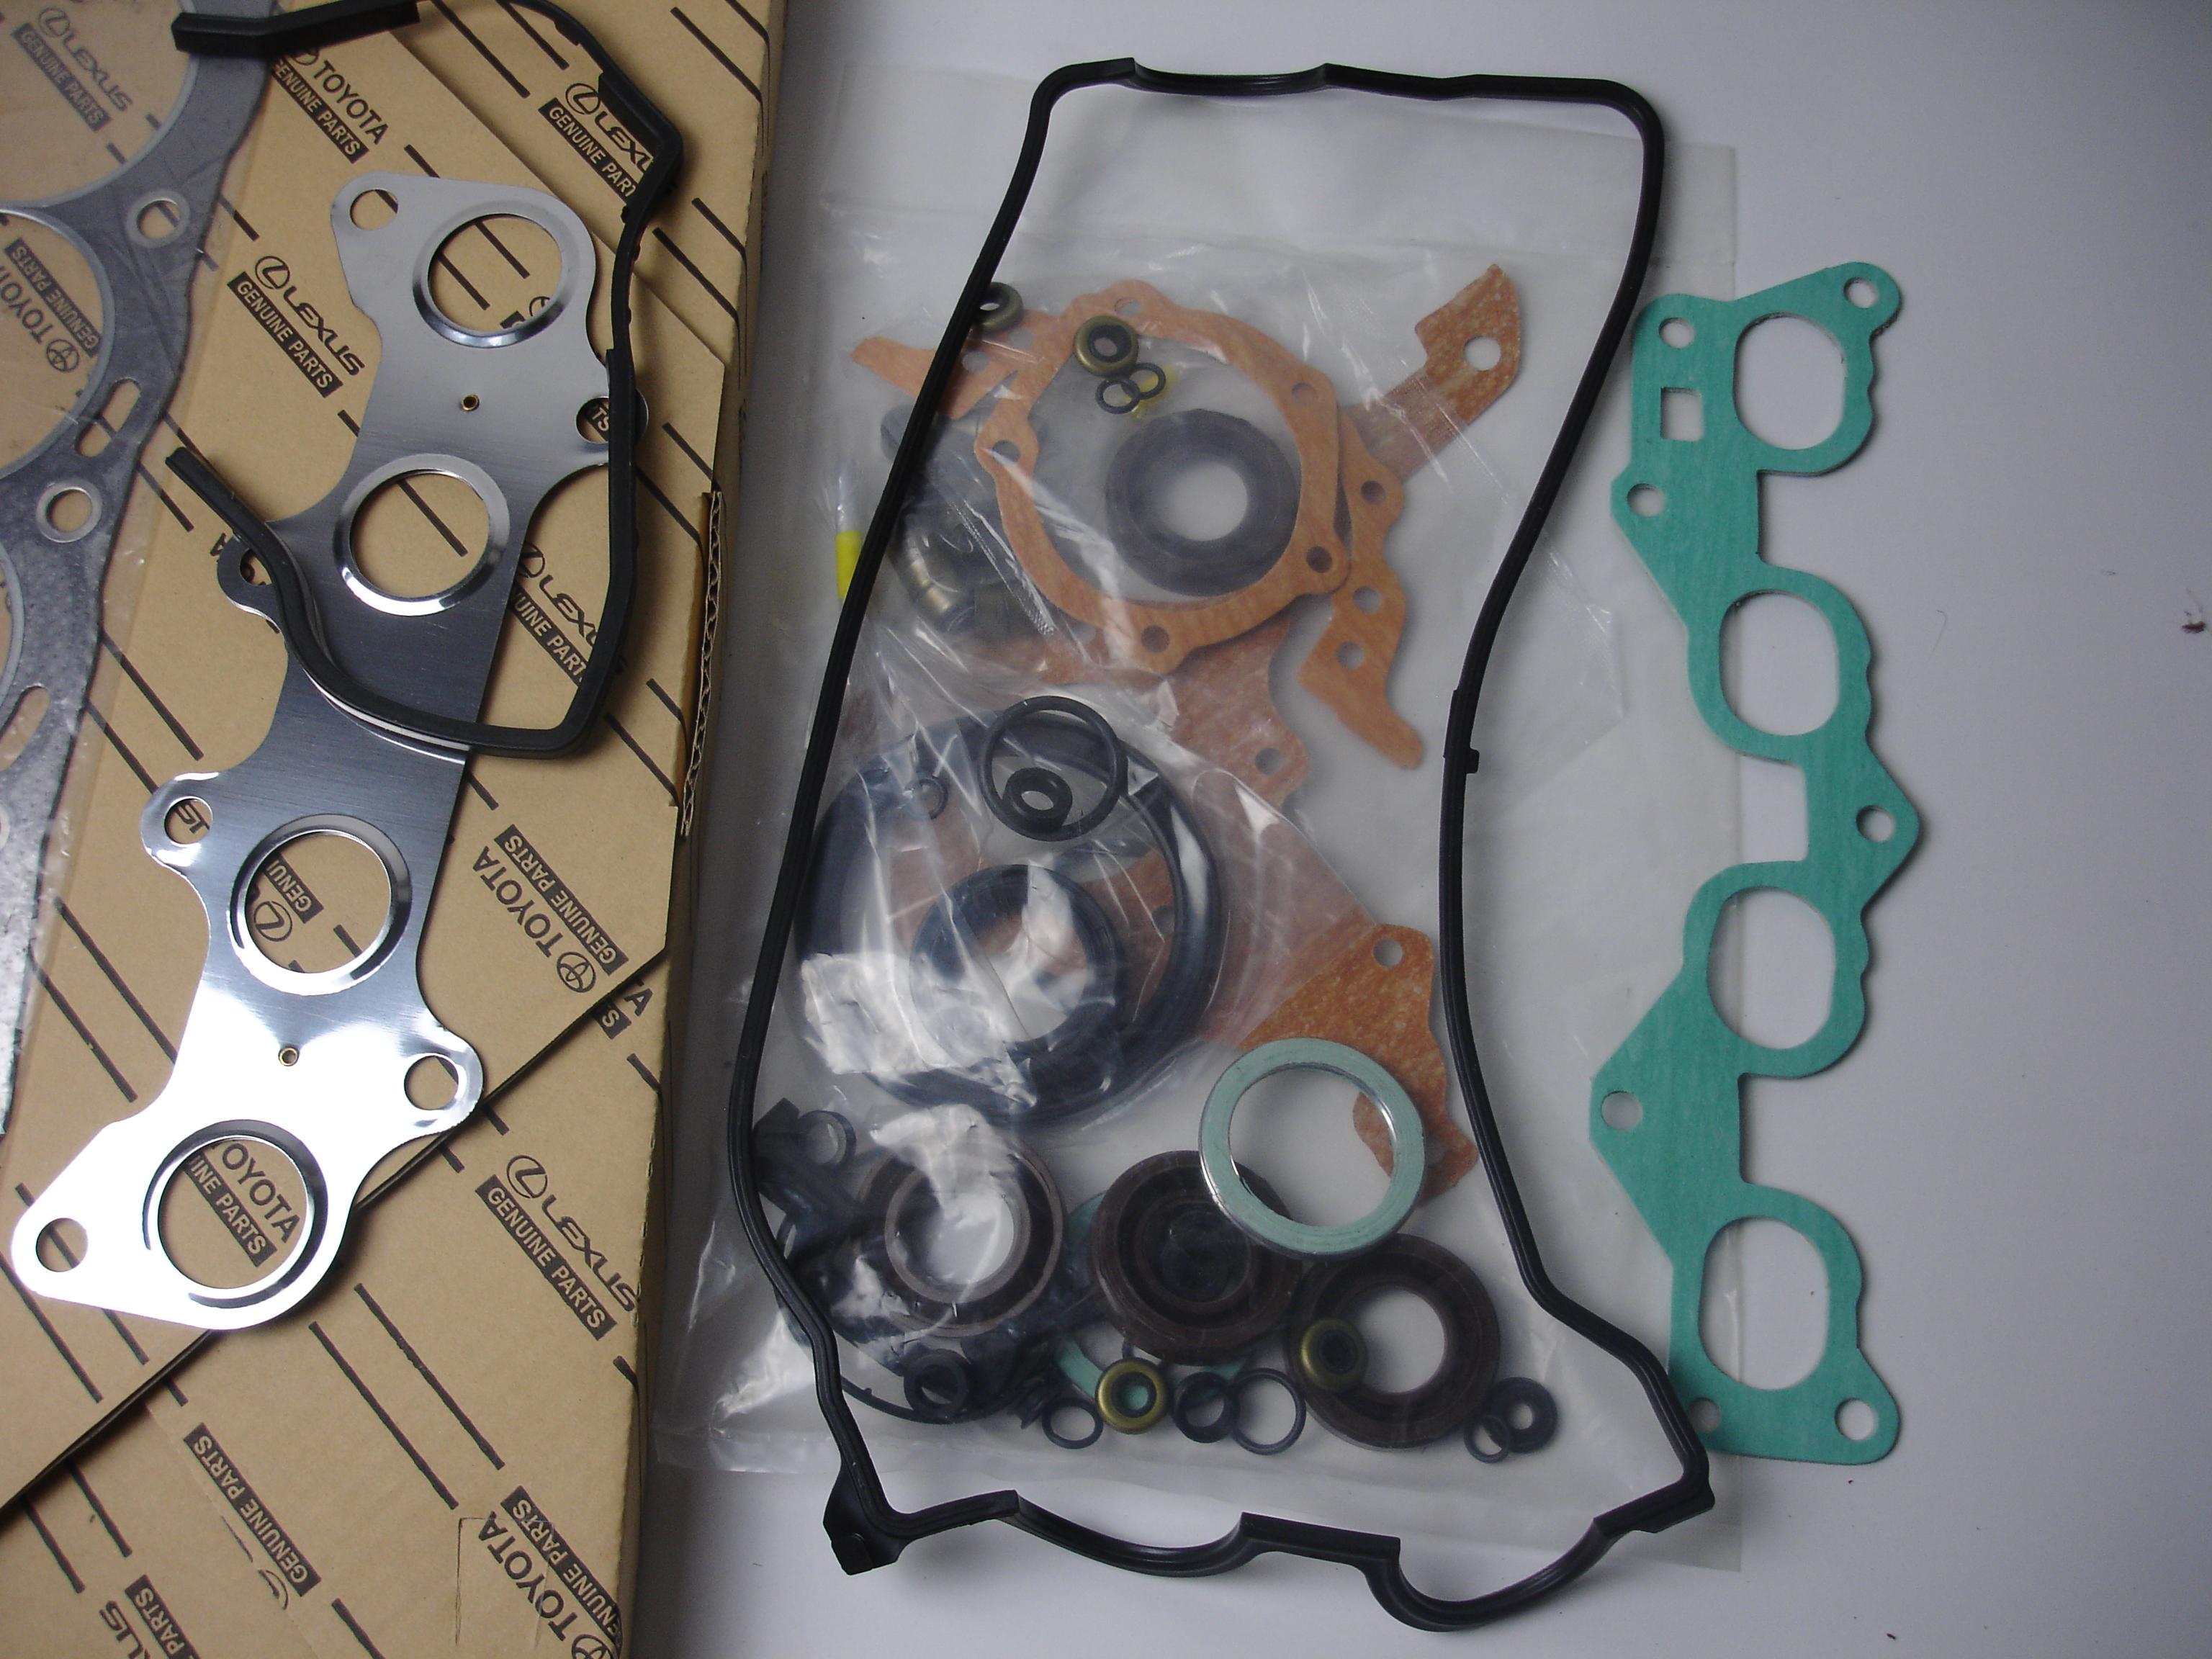 04111-11150 Toyota OEm gsket overhaul kit 5efe